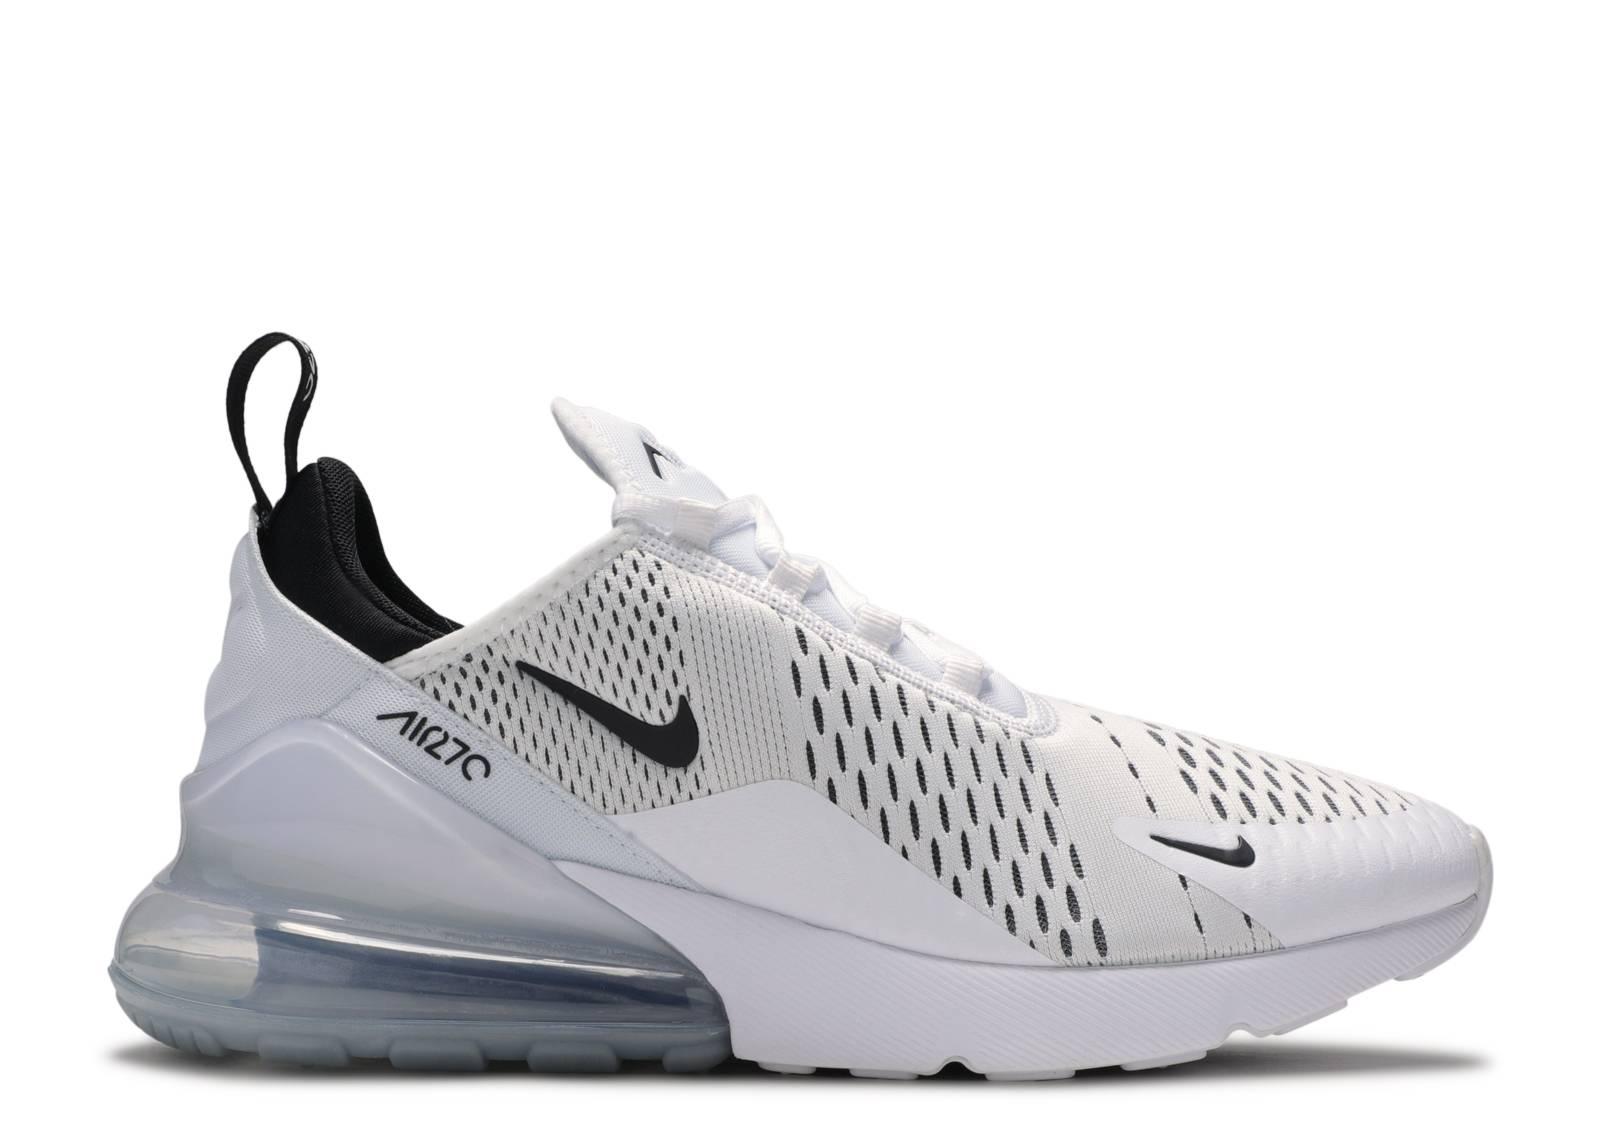 Palmadita descuento adoptar  Nike Air Max 270 Sneakers | Flight Club